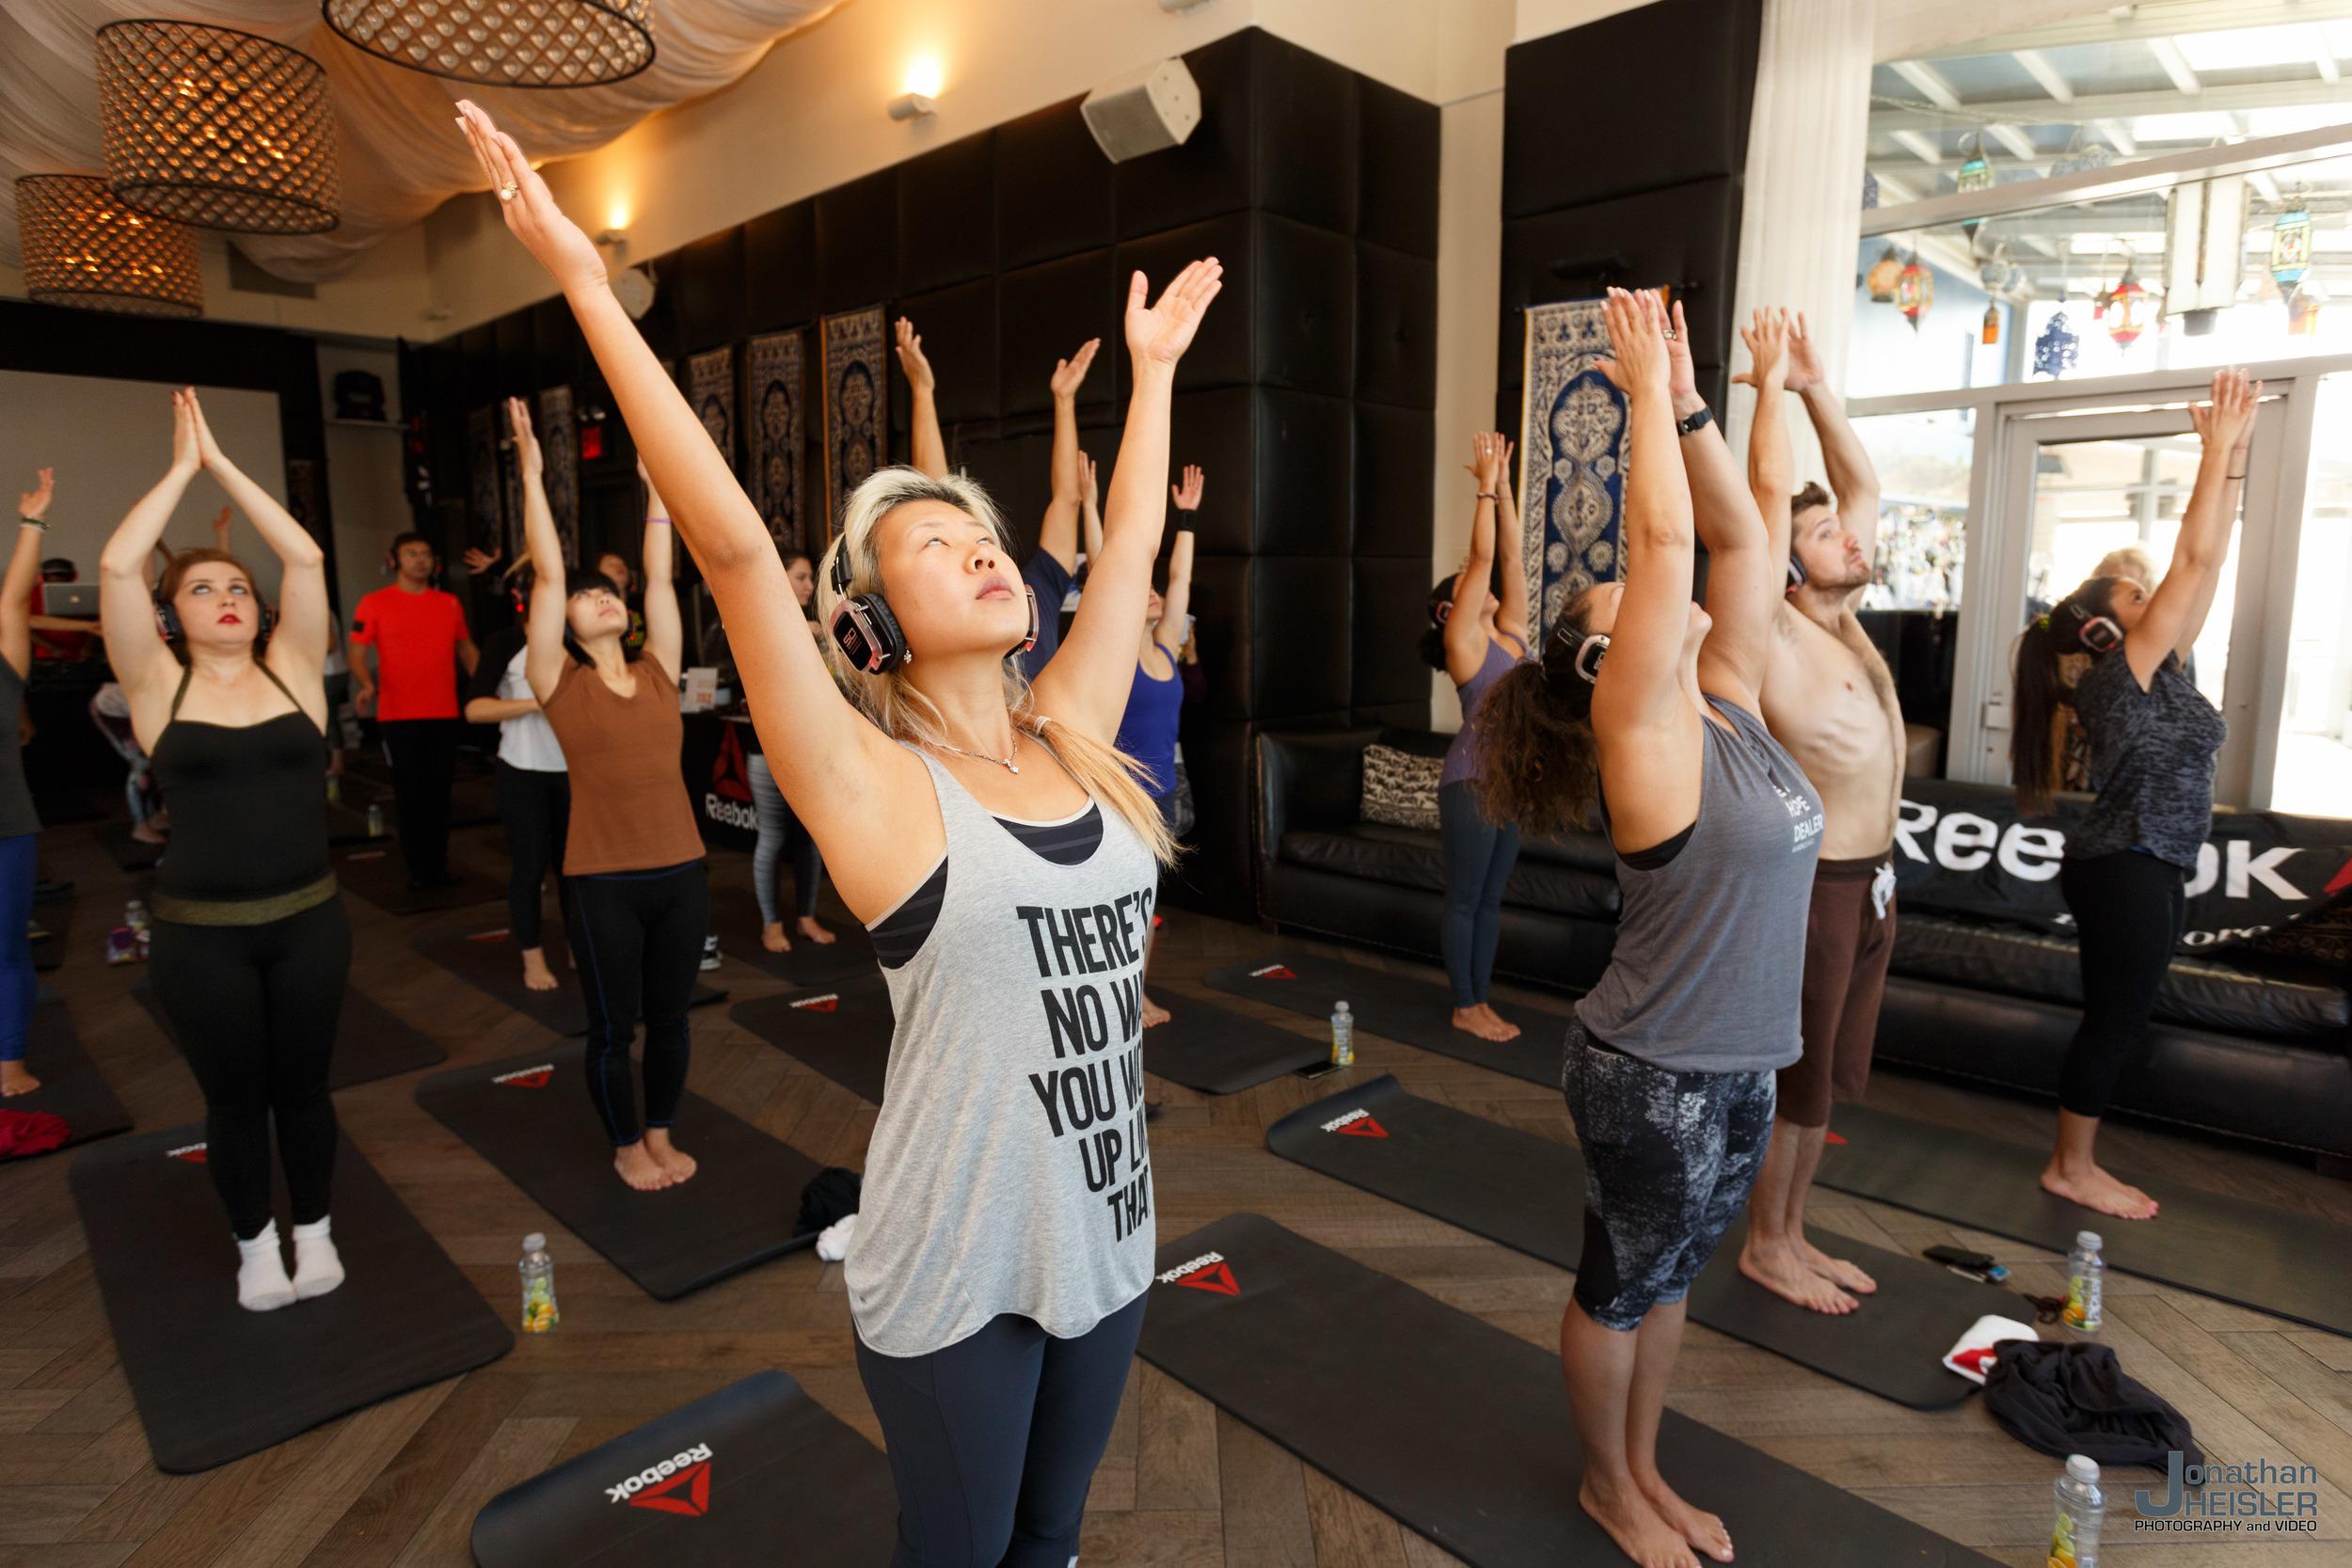 Reebok NYC Yoga_ Gansevoort Hotel NYC __  Jonathan Heisler _ 11.21.2015_022f_4.5.jpg